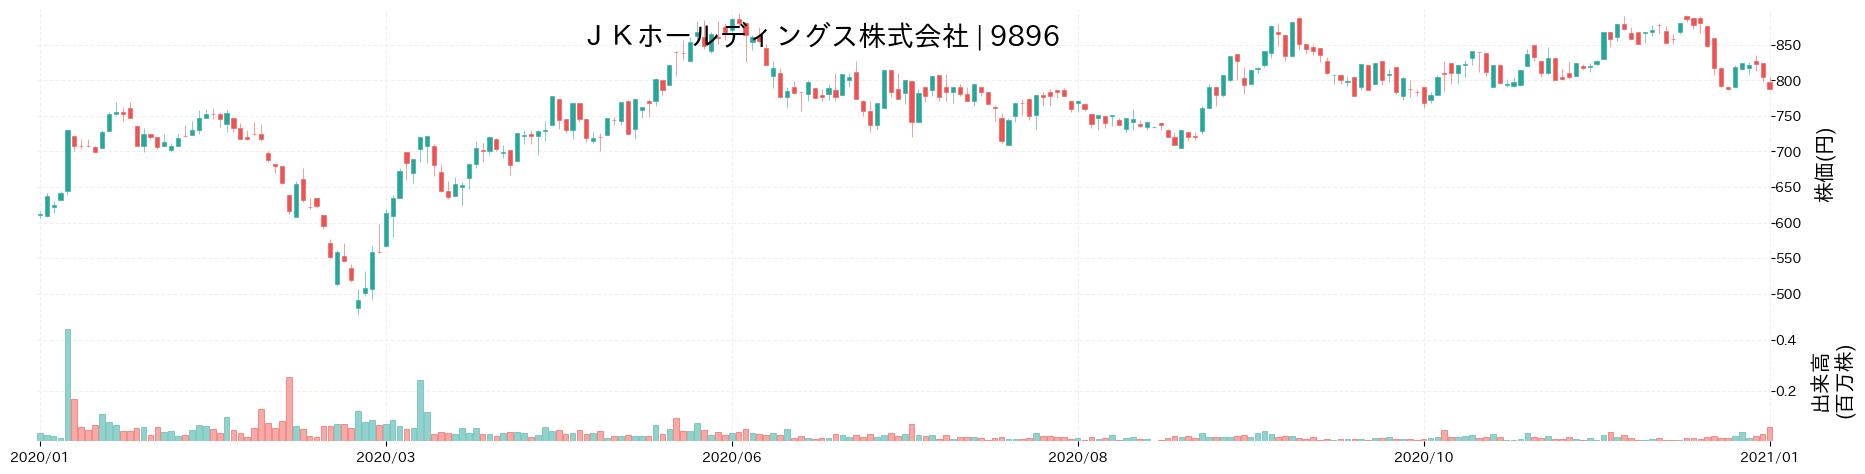 JKホールディングス株式会社の株価推移(2020)